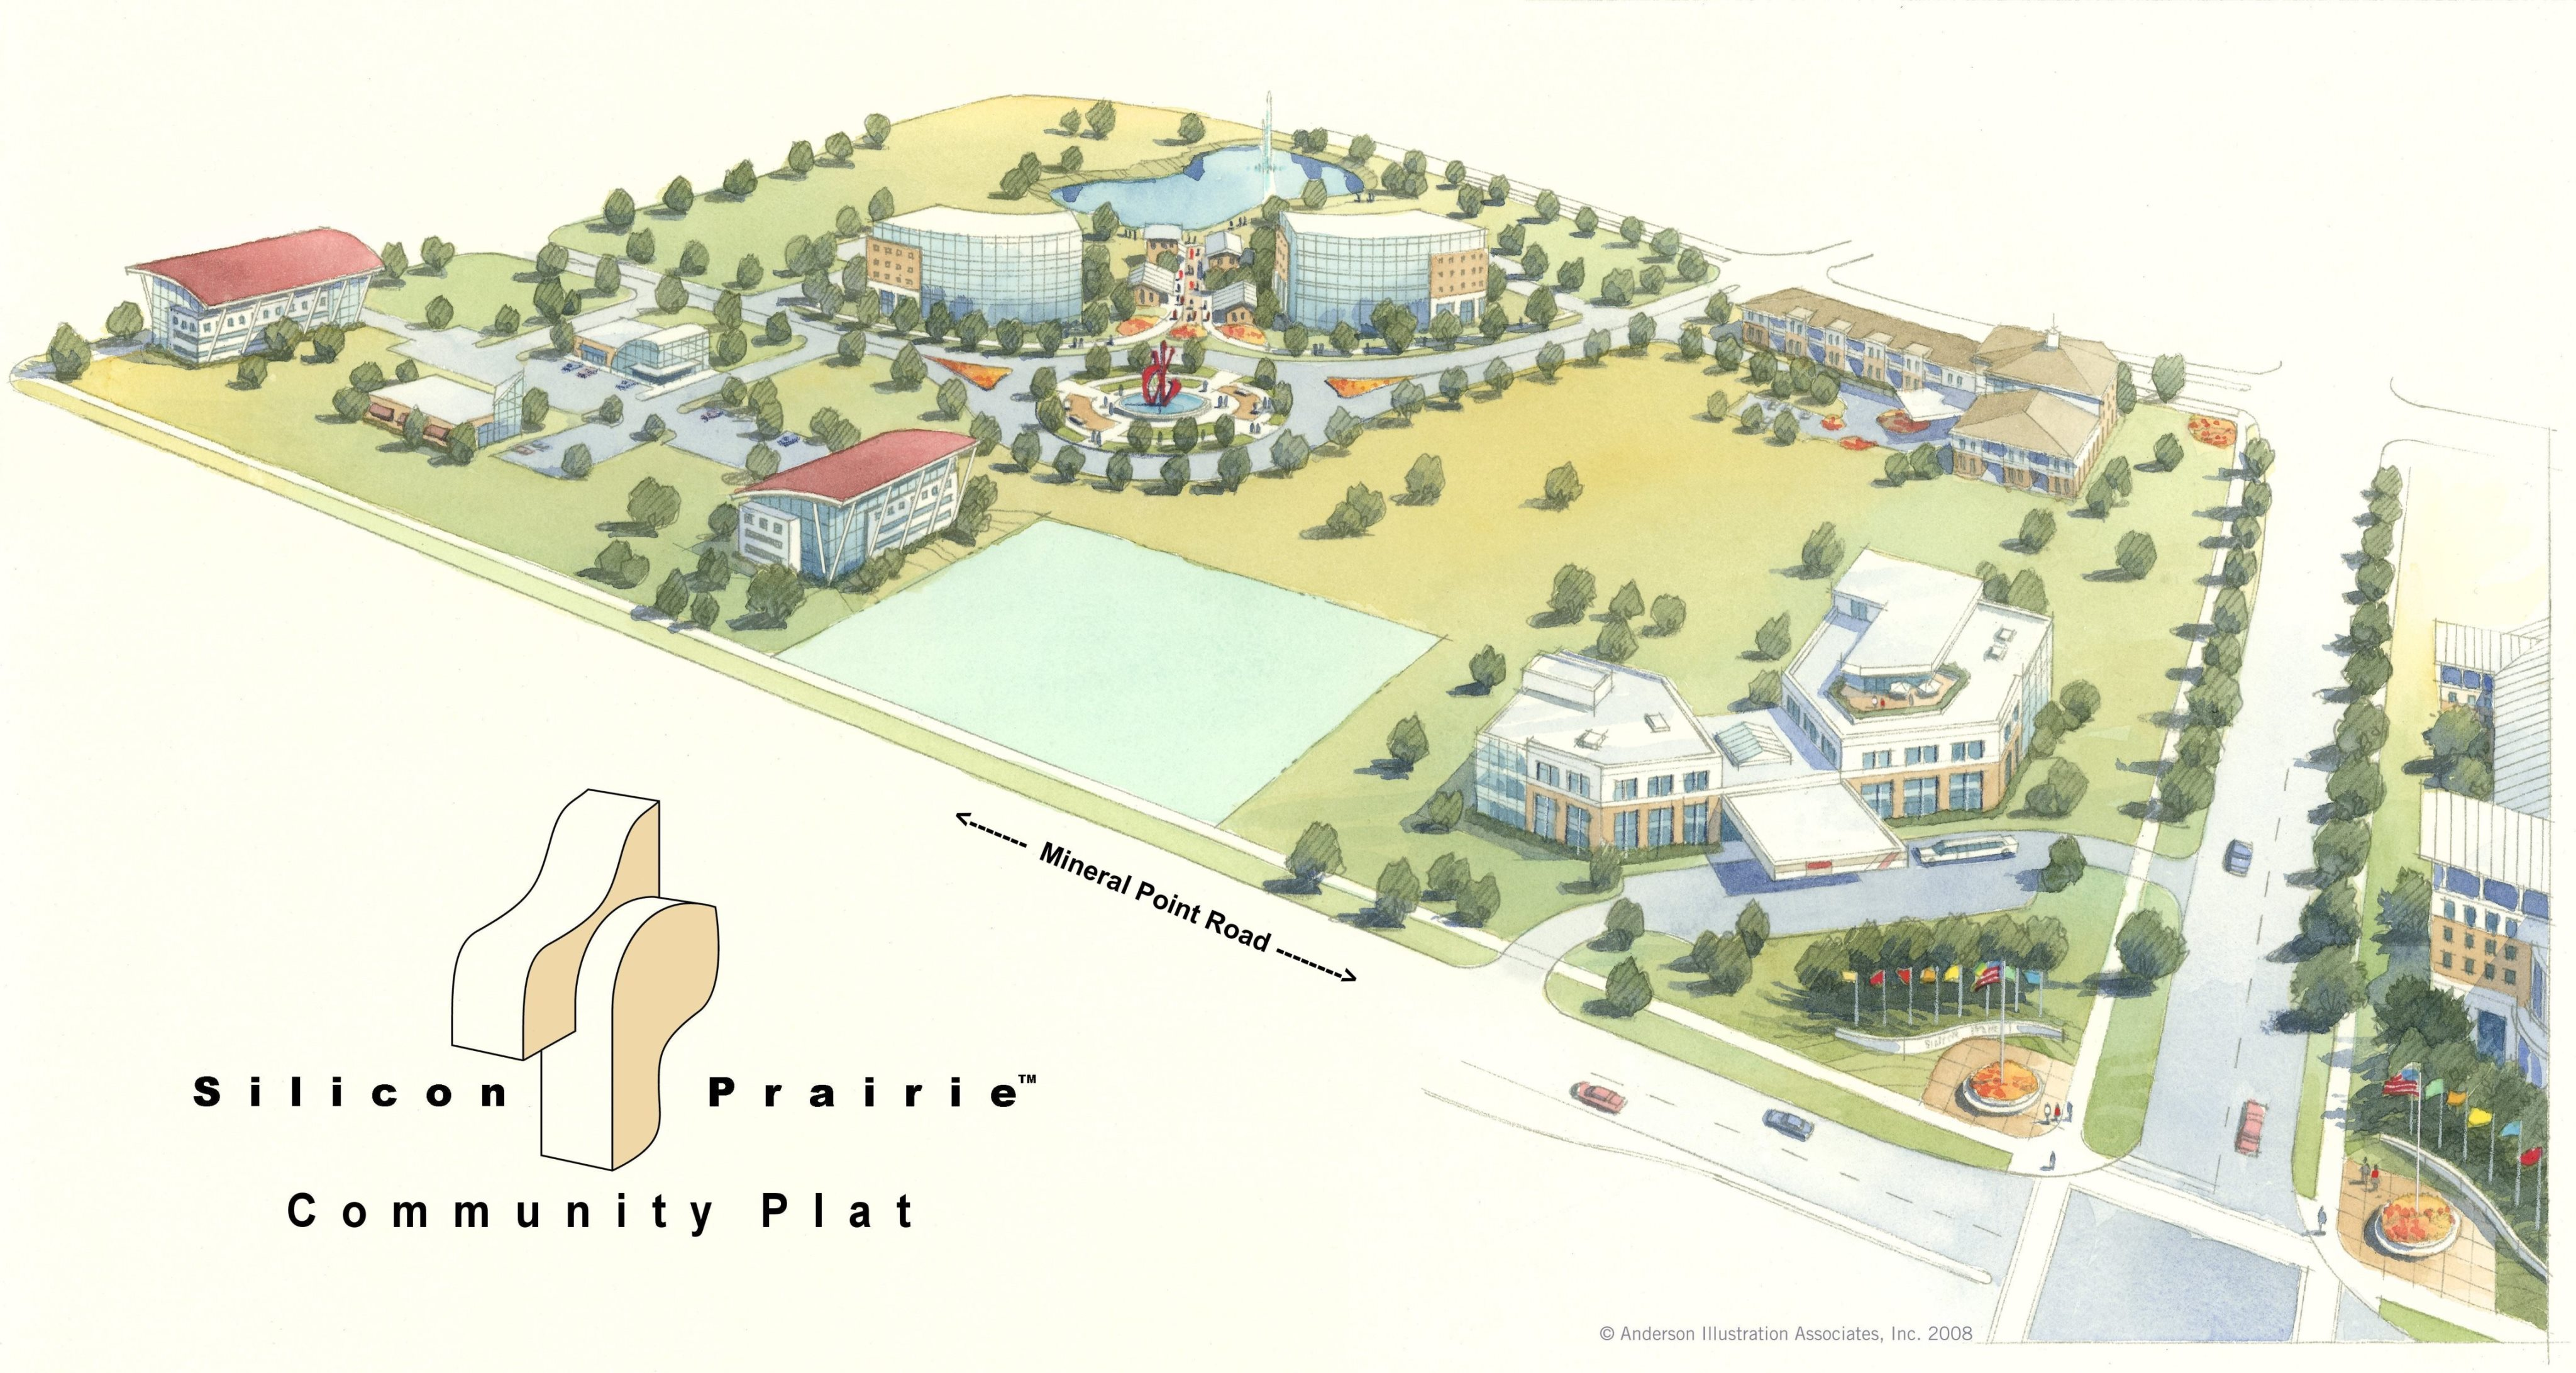 Rendering Anderson Illustration Associates © 2008 Silicon Prairie™ Community Plat